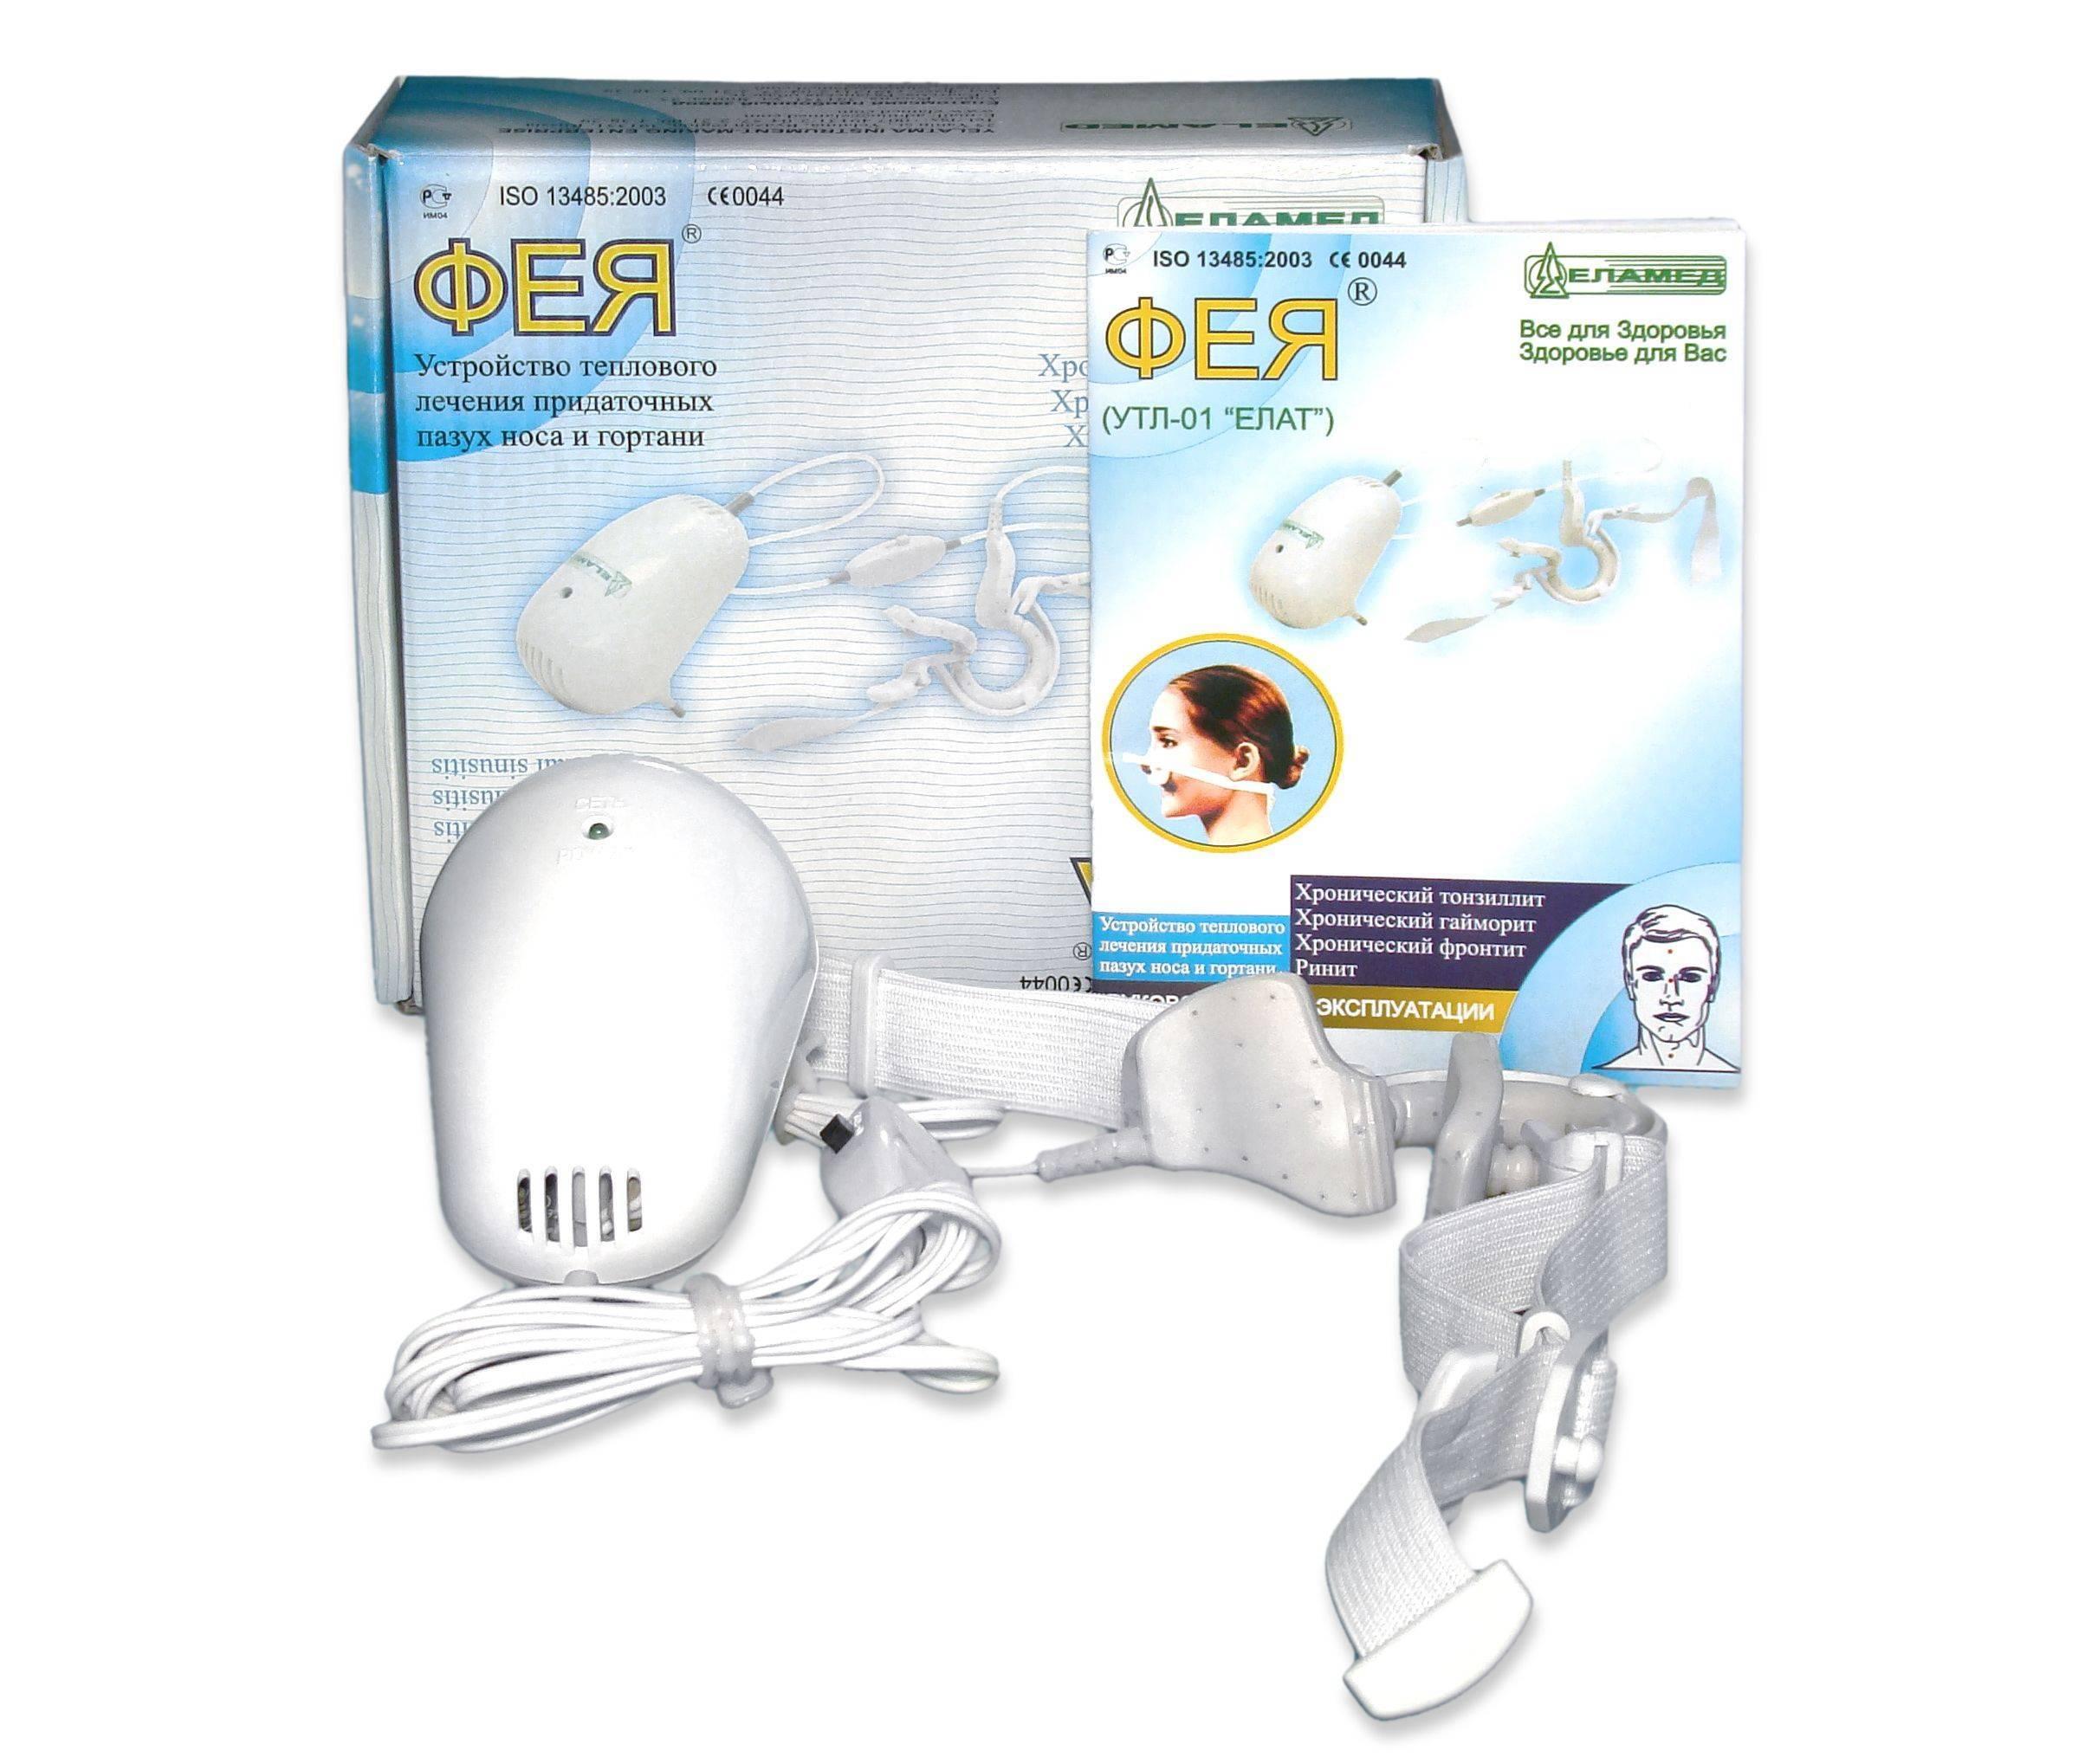 Какими аппаратами можно прогревать нос в домашних условиях?